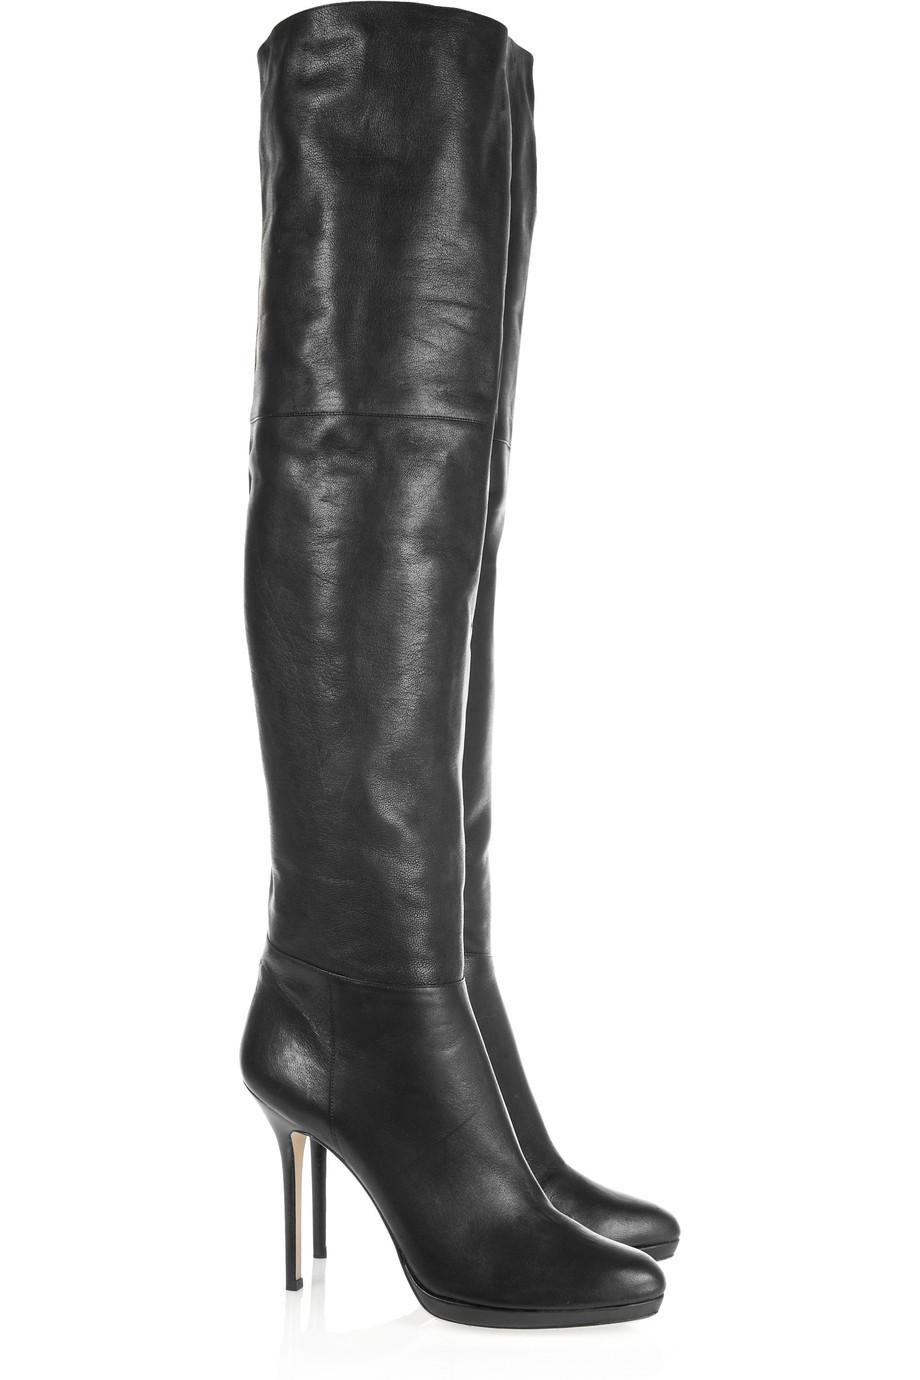 jimmy choo thigh high boots david simchi levi